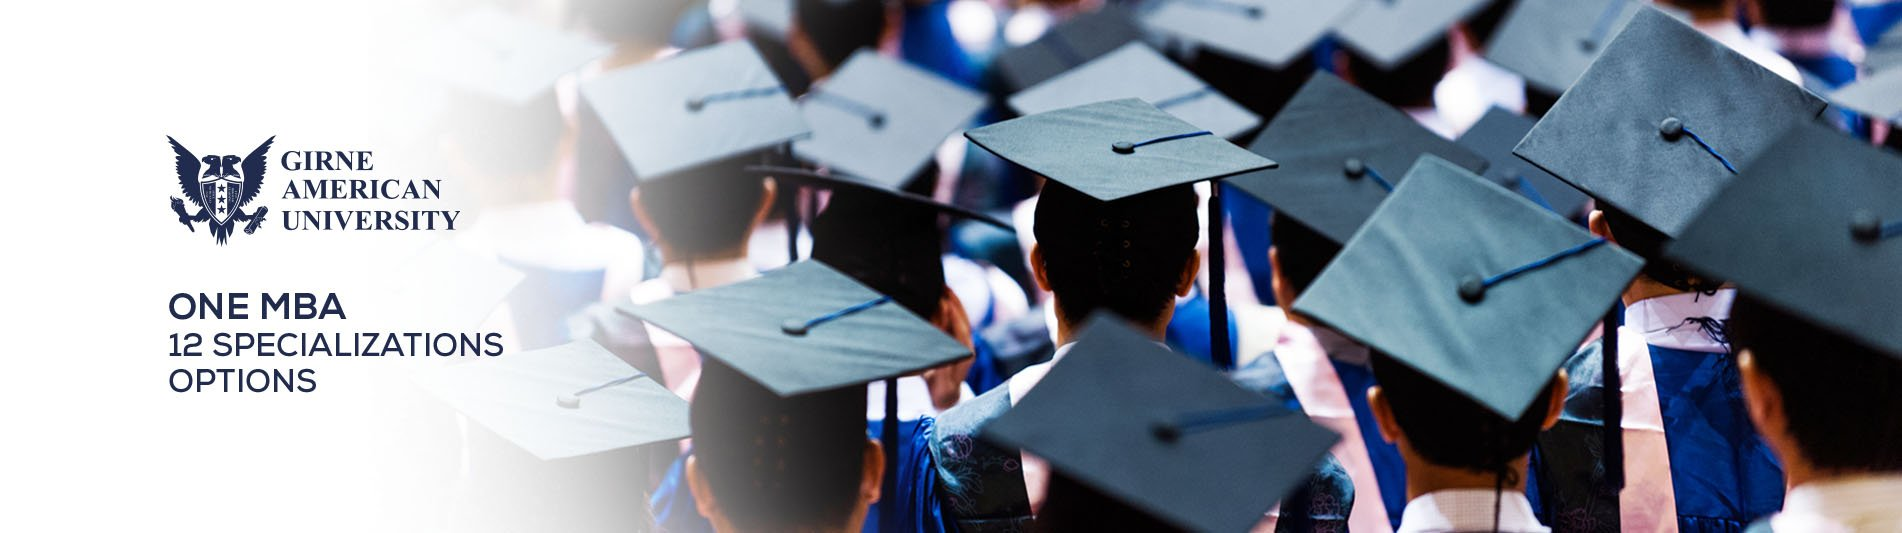 GAU MBA Programs - Banner